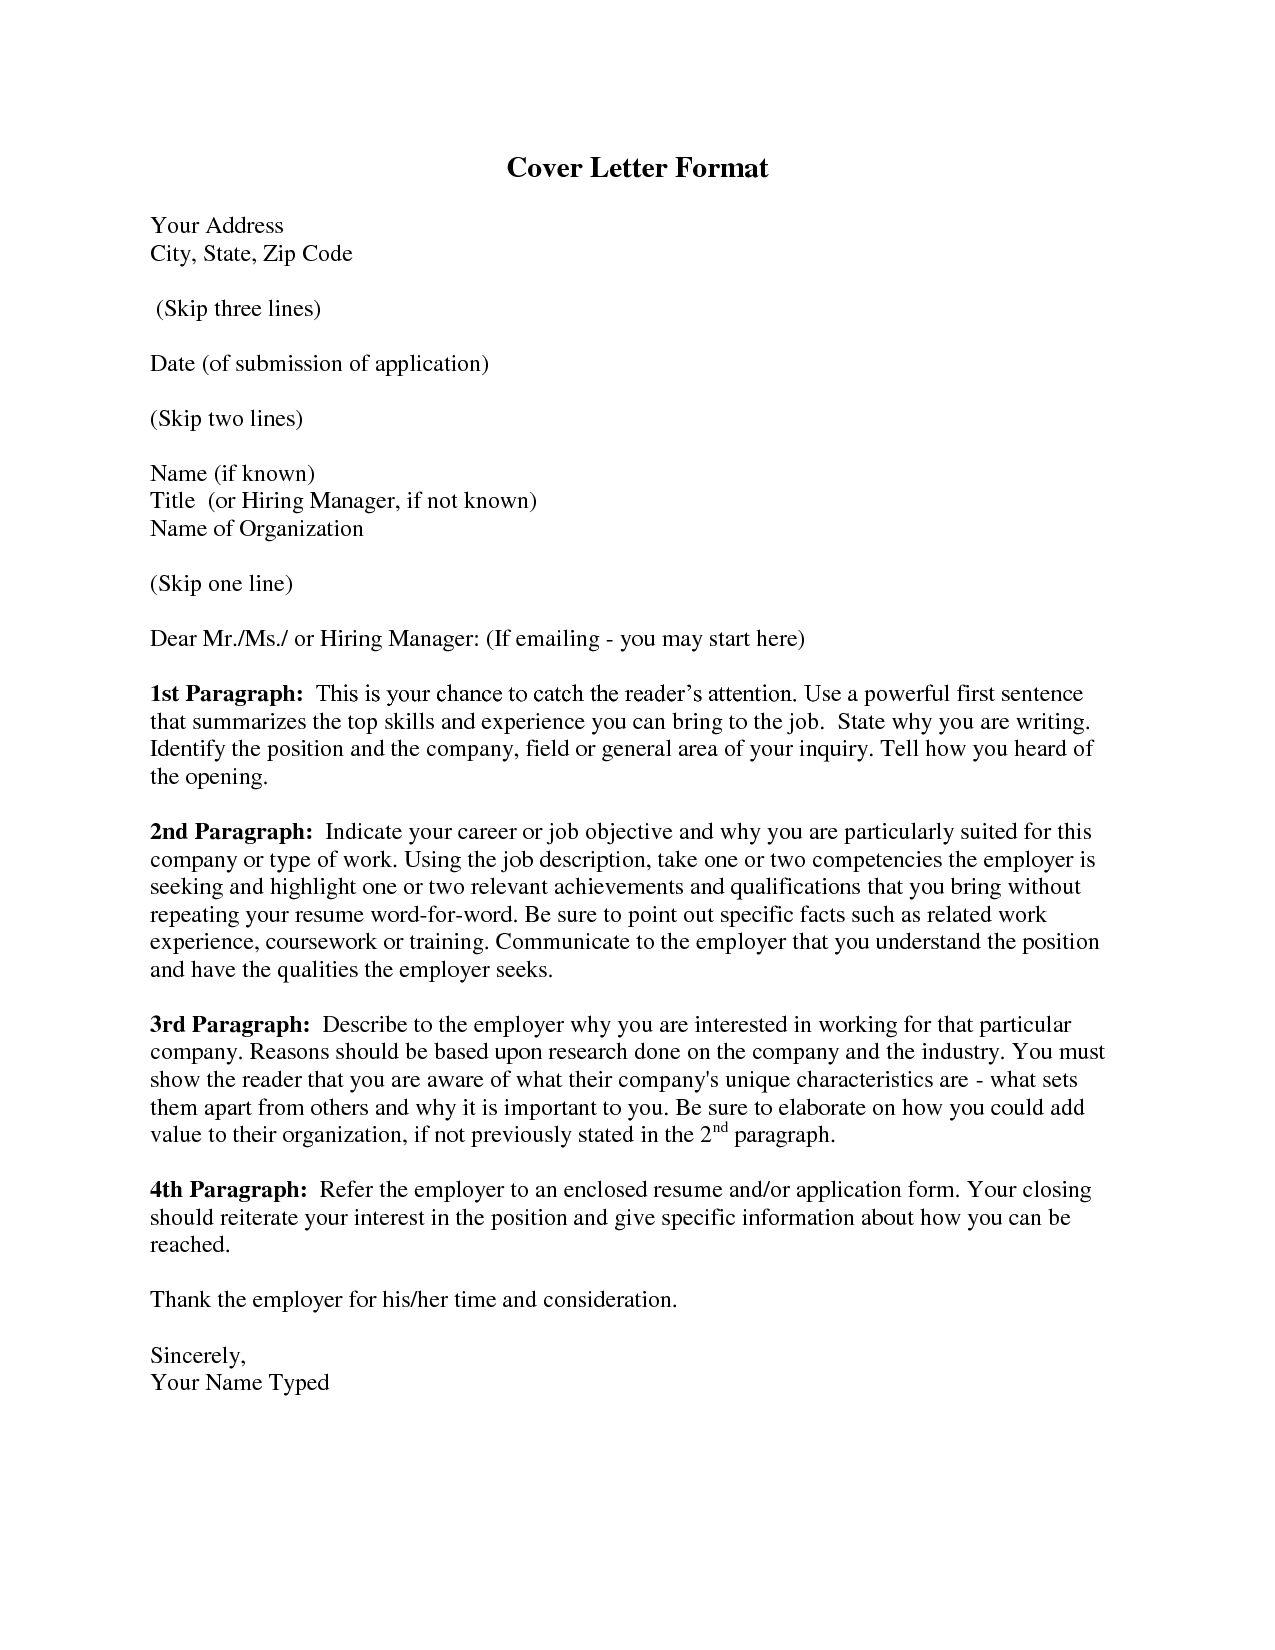 30 Cover Letter For Job Application Cover Letter Designs